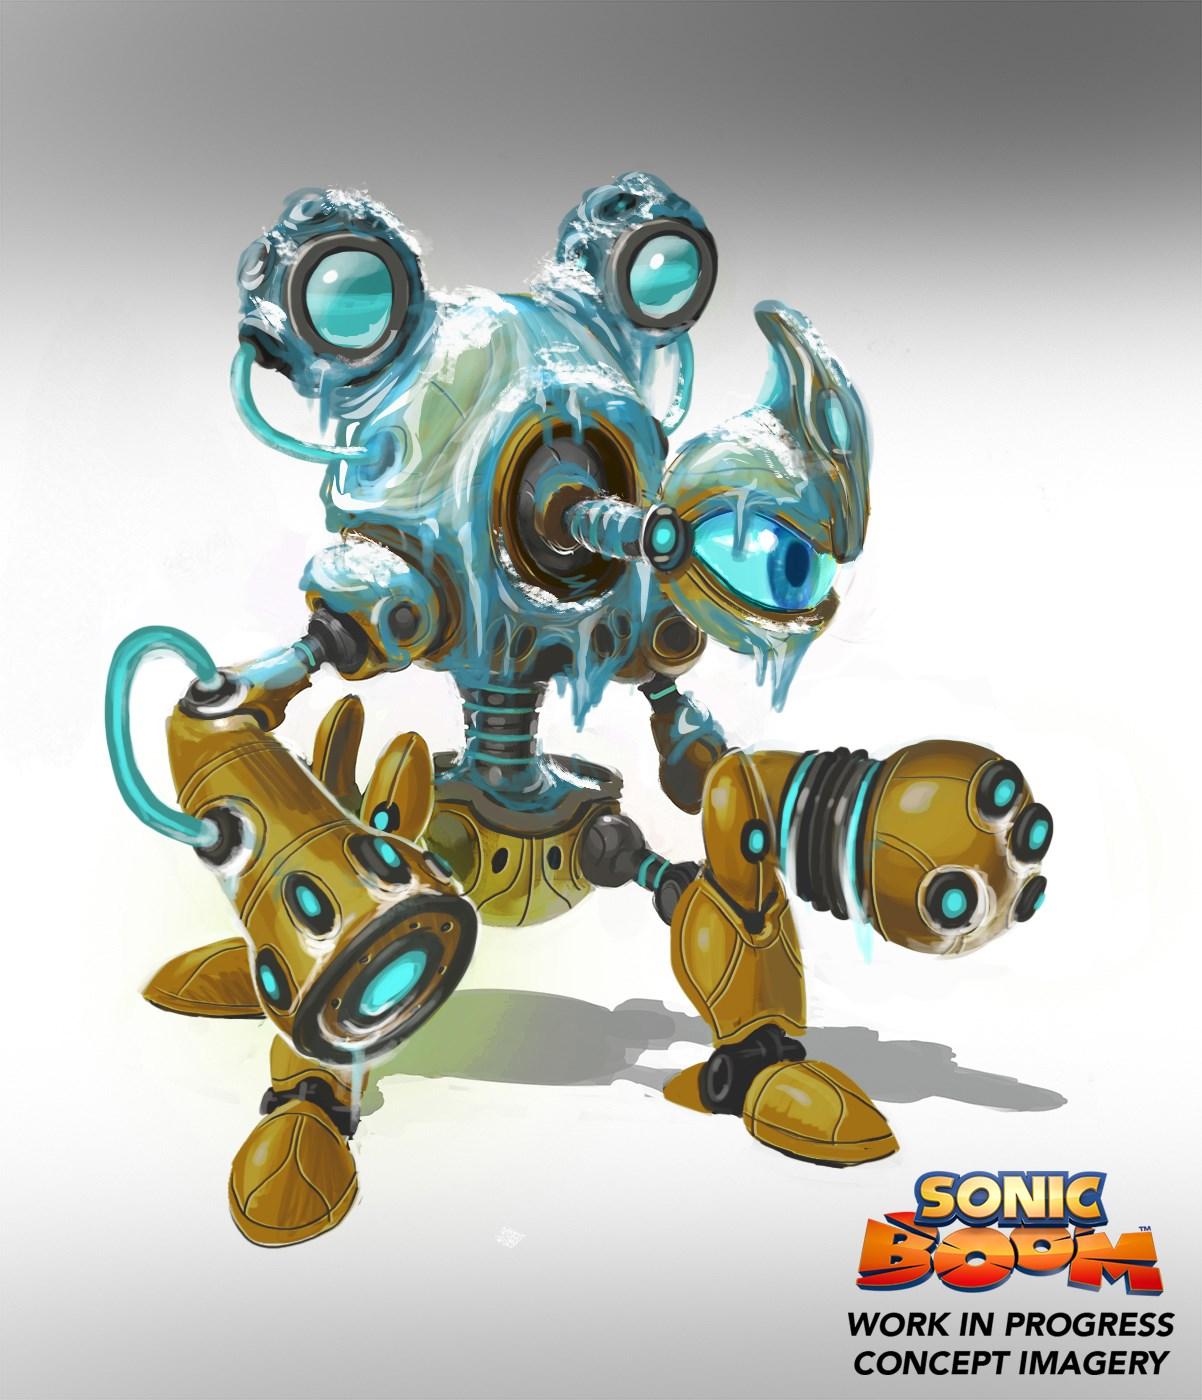 Sonic Boom 14-08-14 Artwork 014